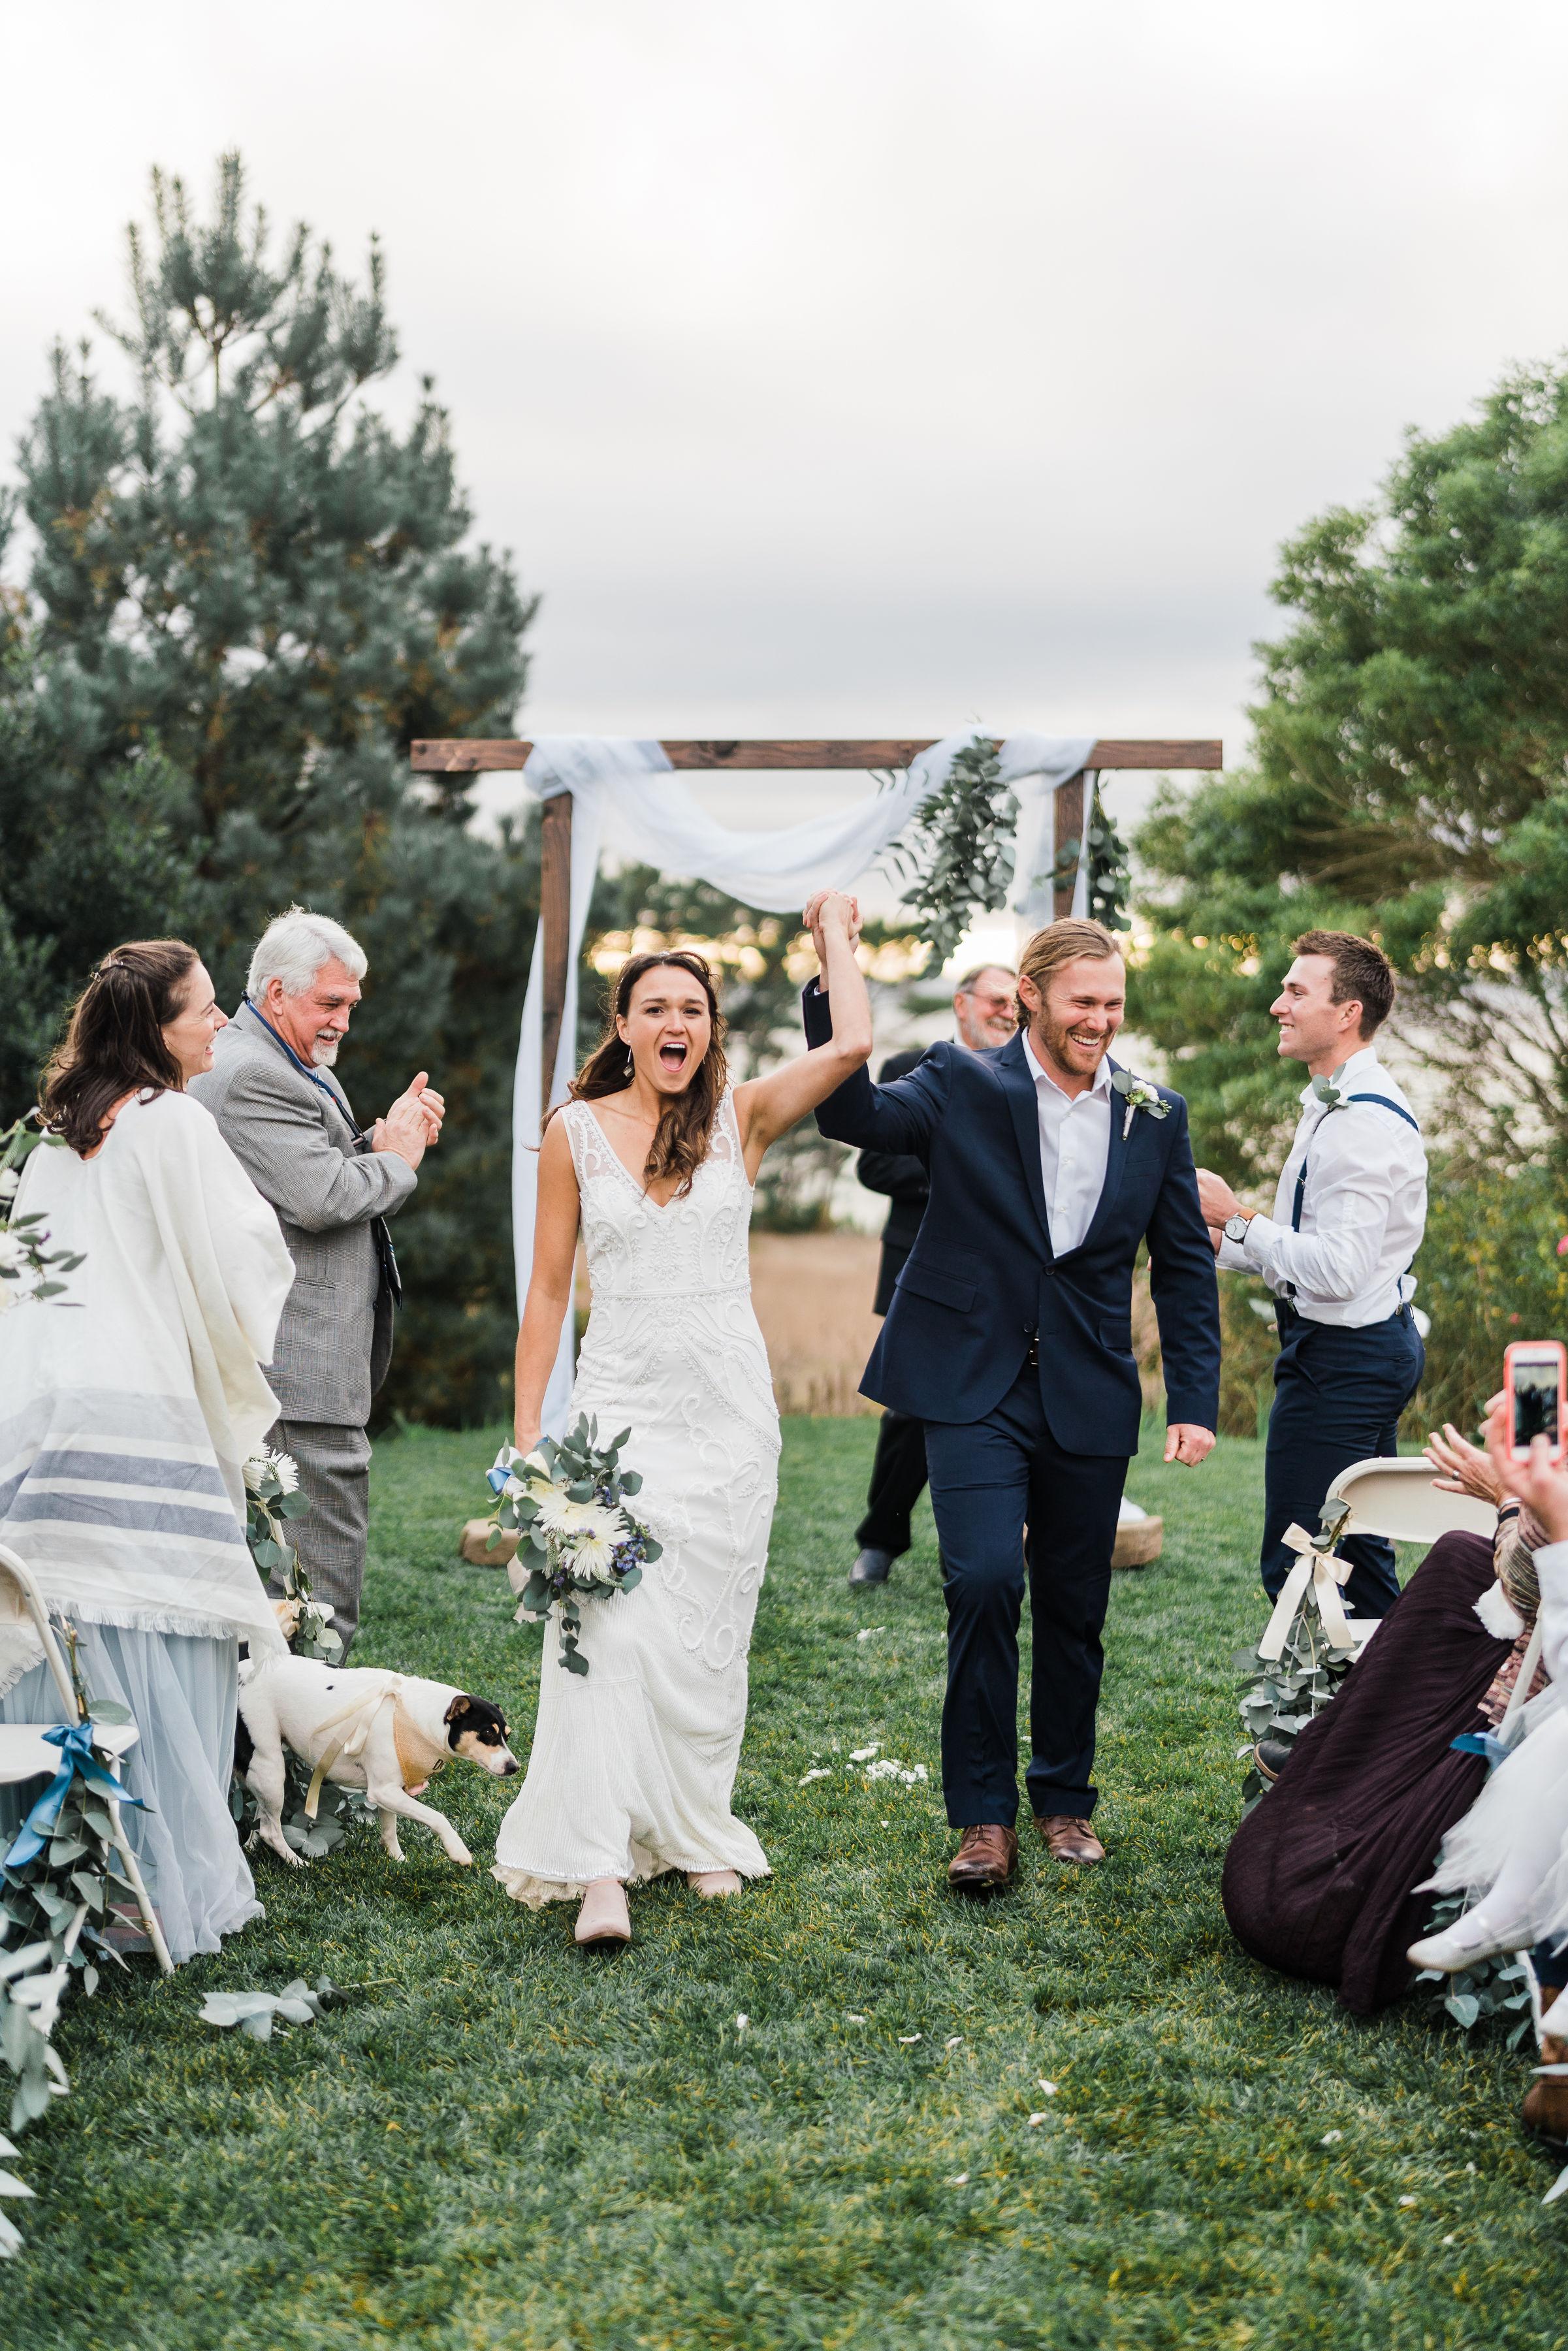 switzer-farm-wedding-westport-brandon-bibbins-photograhy-fine-art-064.jpg